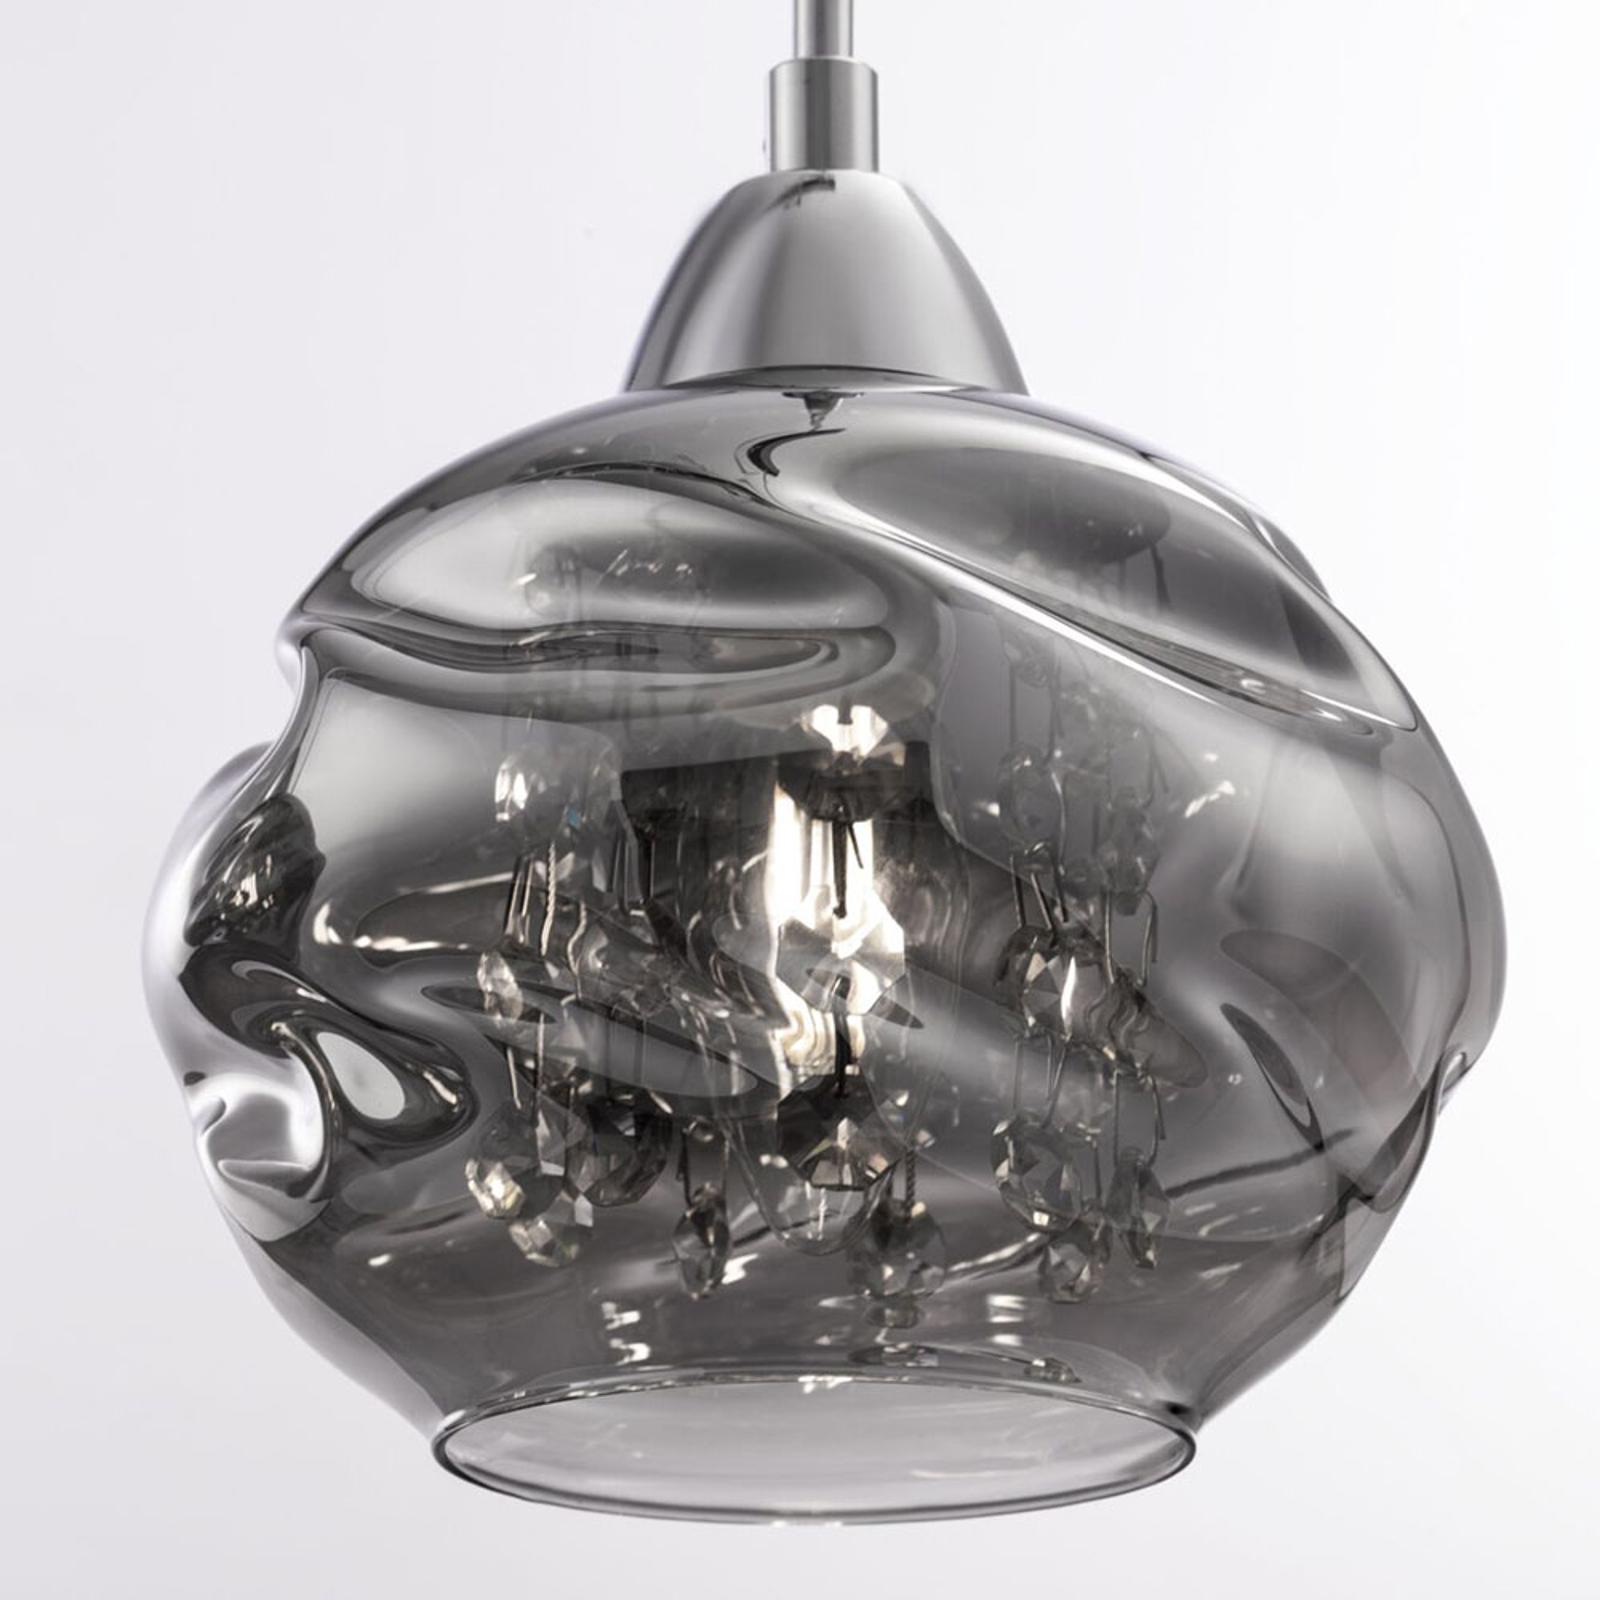 Lampa wisząca Haze, 3-punktowa szklane klosze